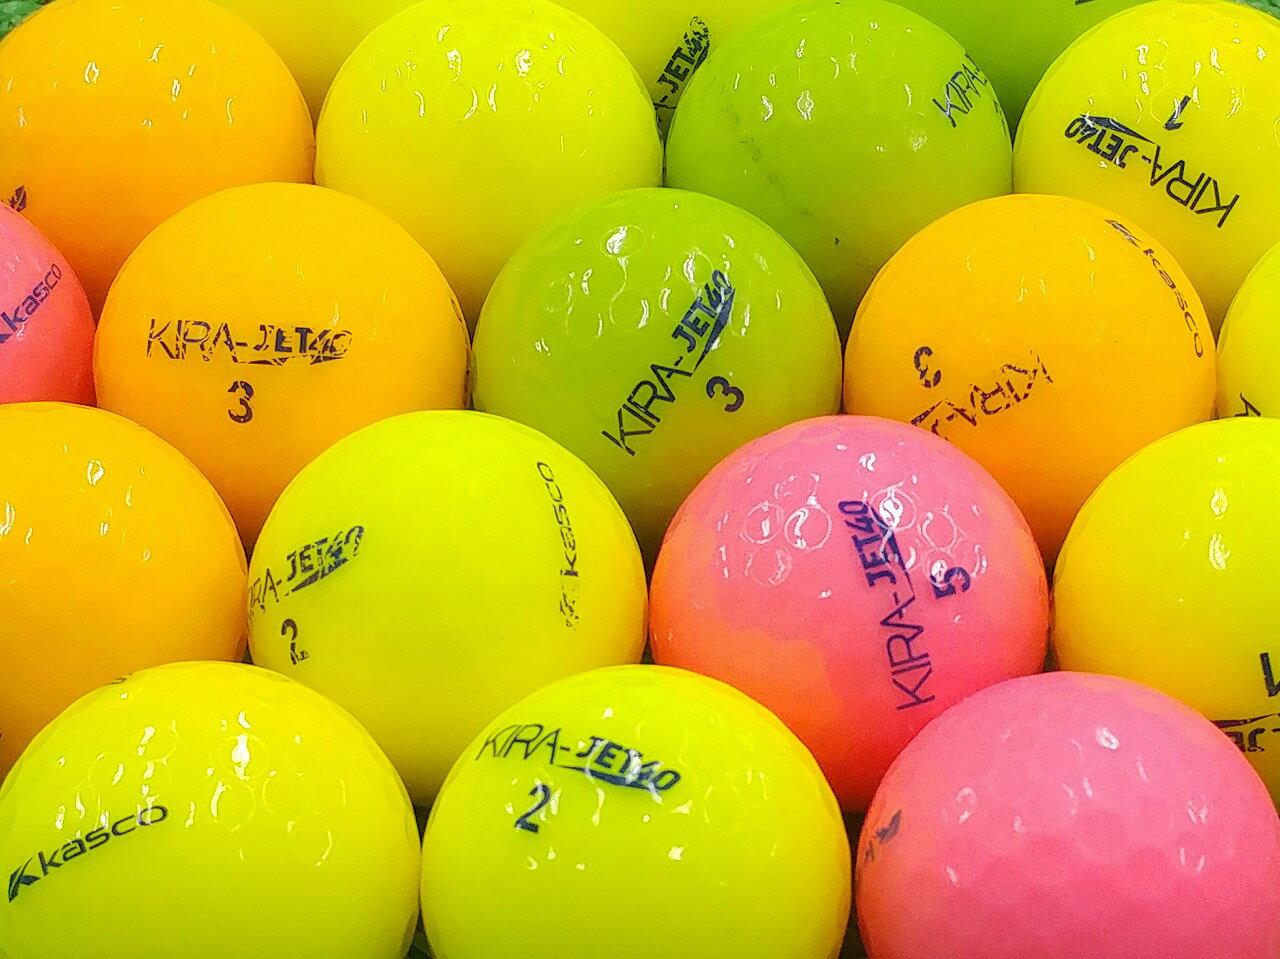 【Bランク】キャスコ KIRA JET40 2013年モデル カラー混合 1個 【あす楽】【ロストボール】【中古】